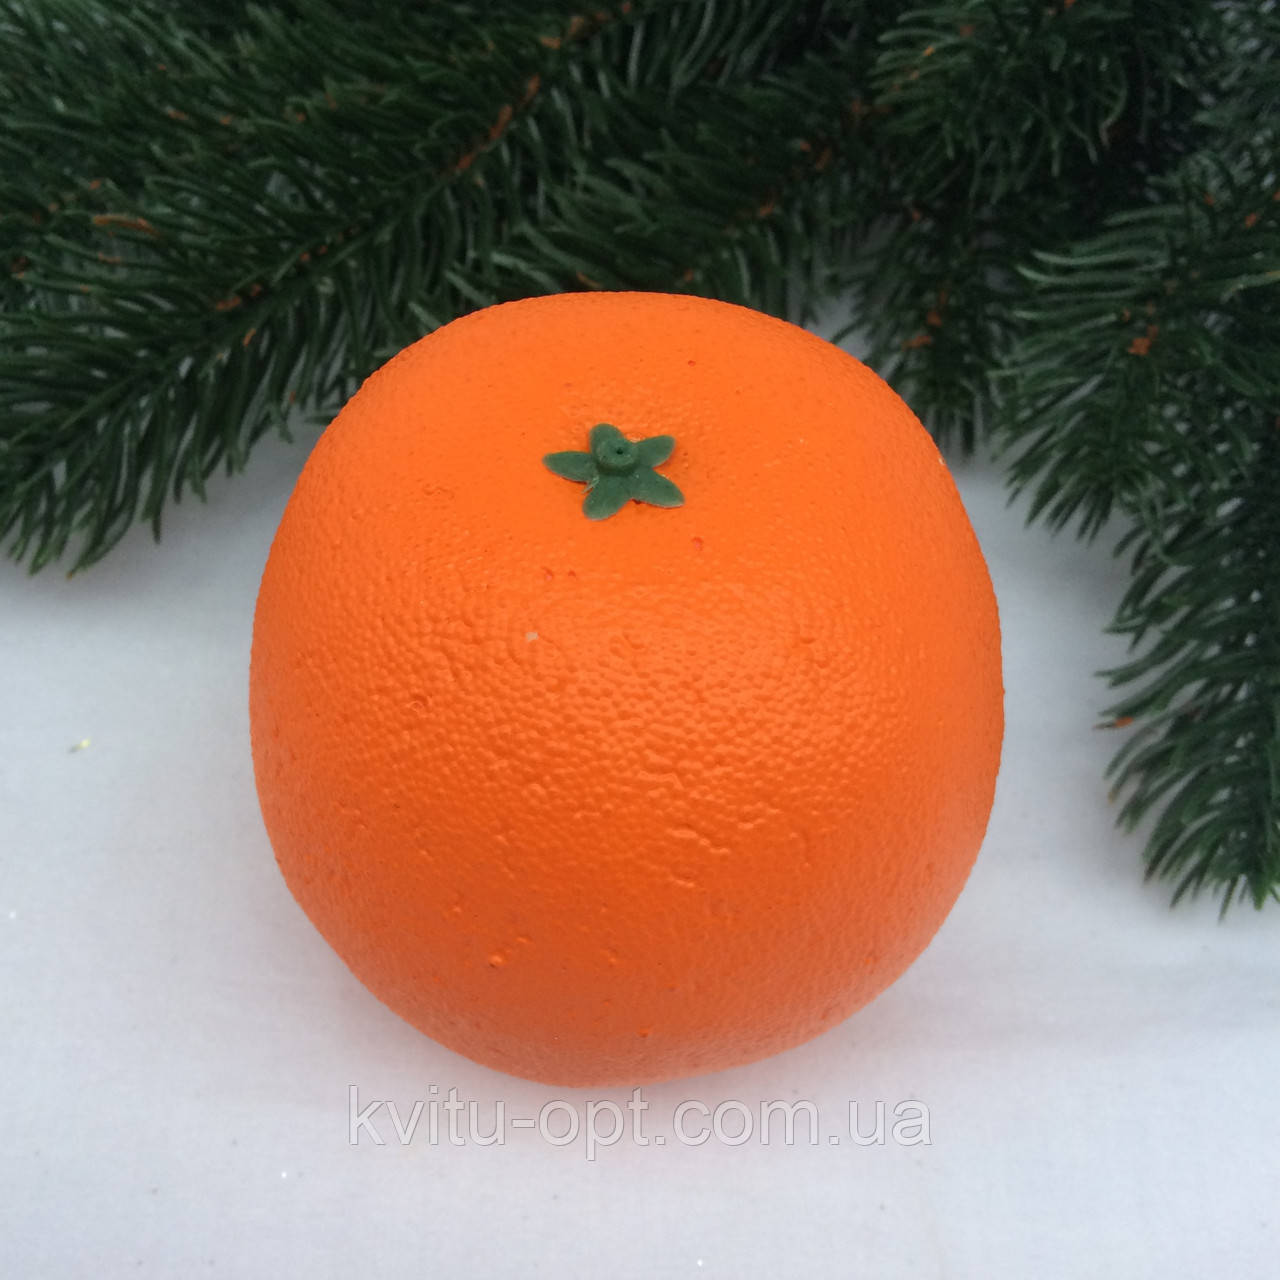 Апельсин муляж 1:1